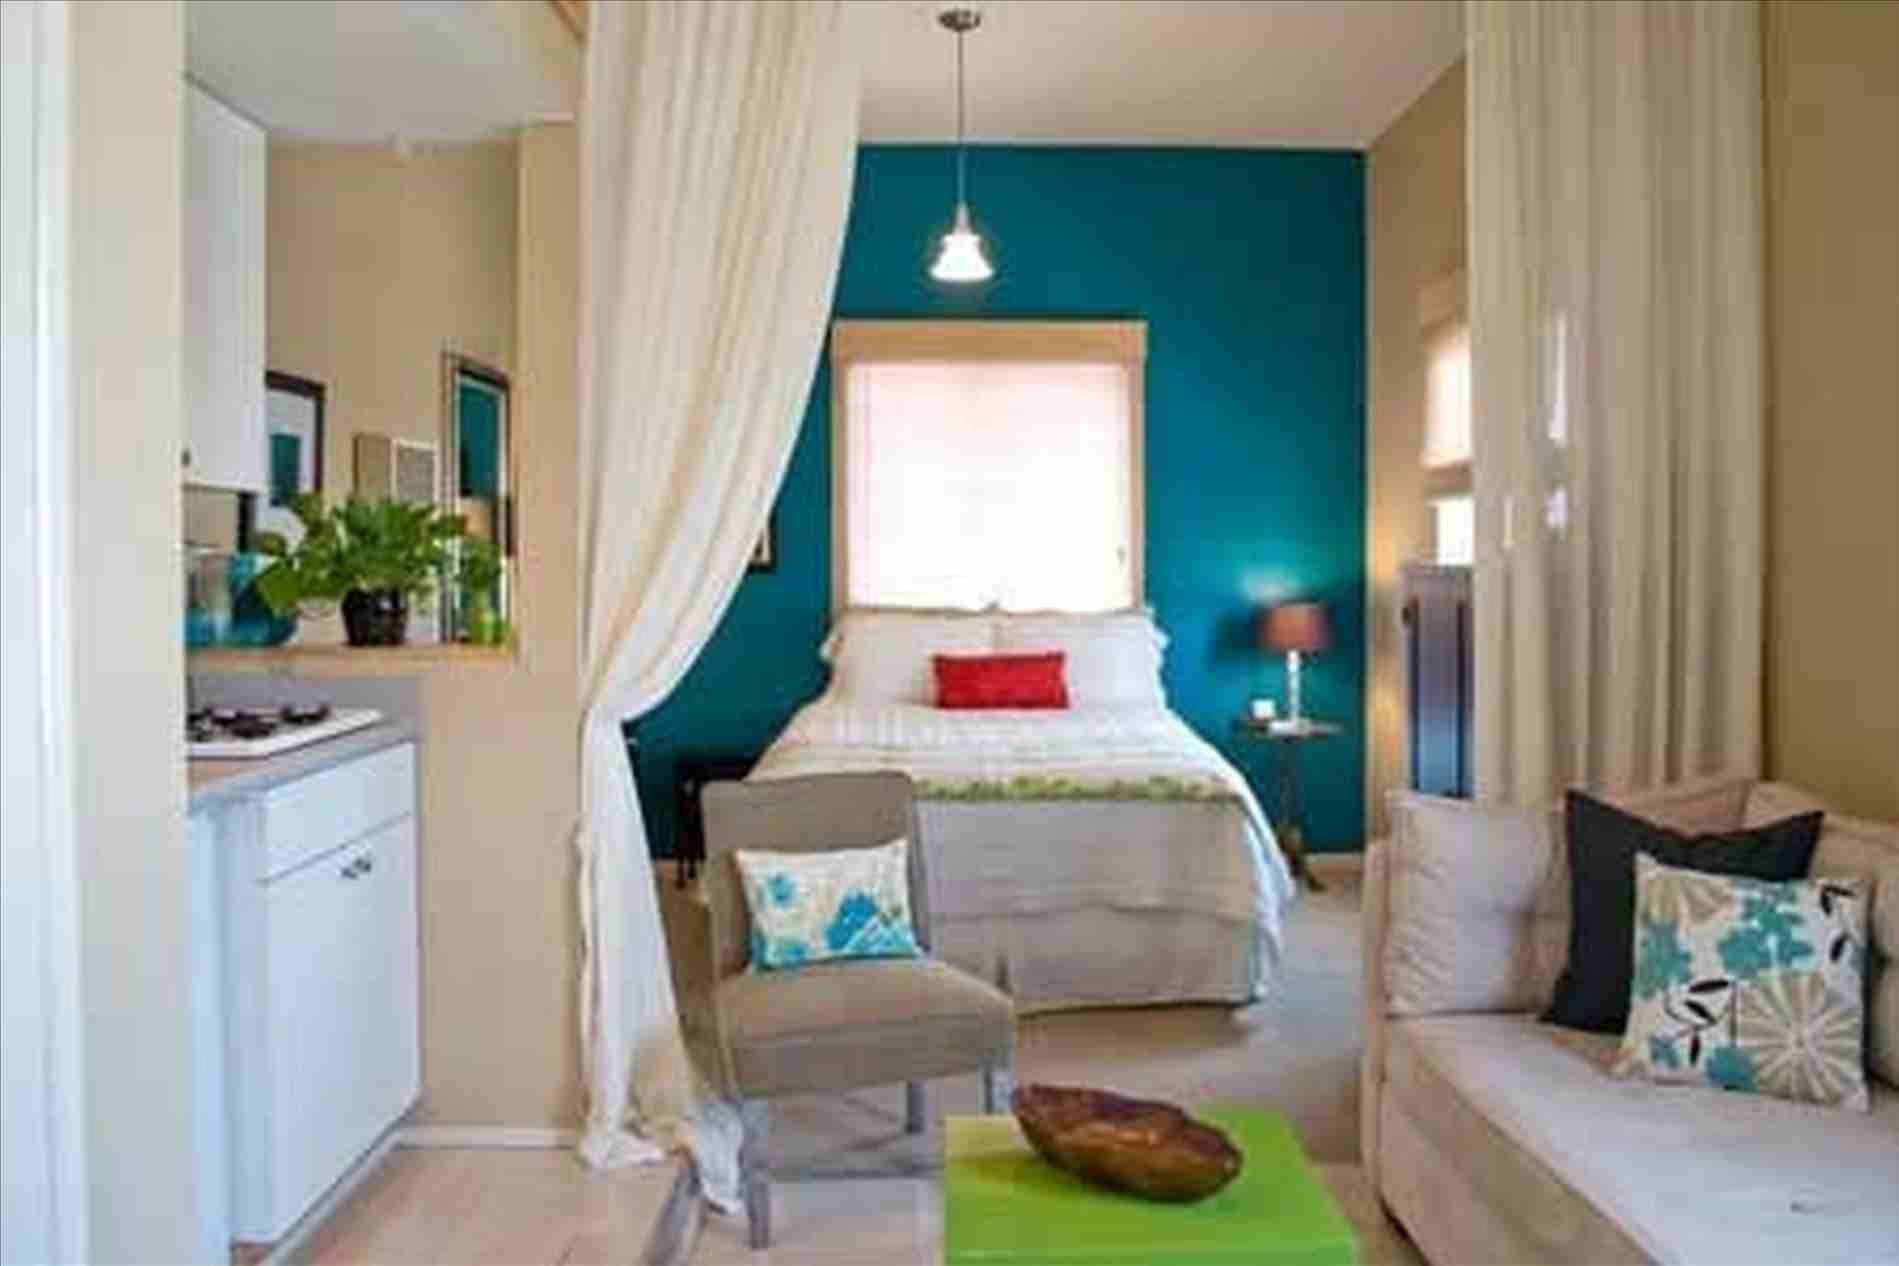 One Bedroom Apartment Interior Design Ideas   Efficacy Apartments Near Me  Lovely Studio Apartment Near Me